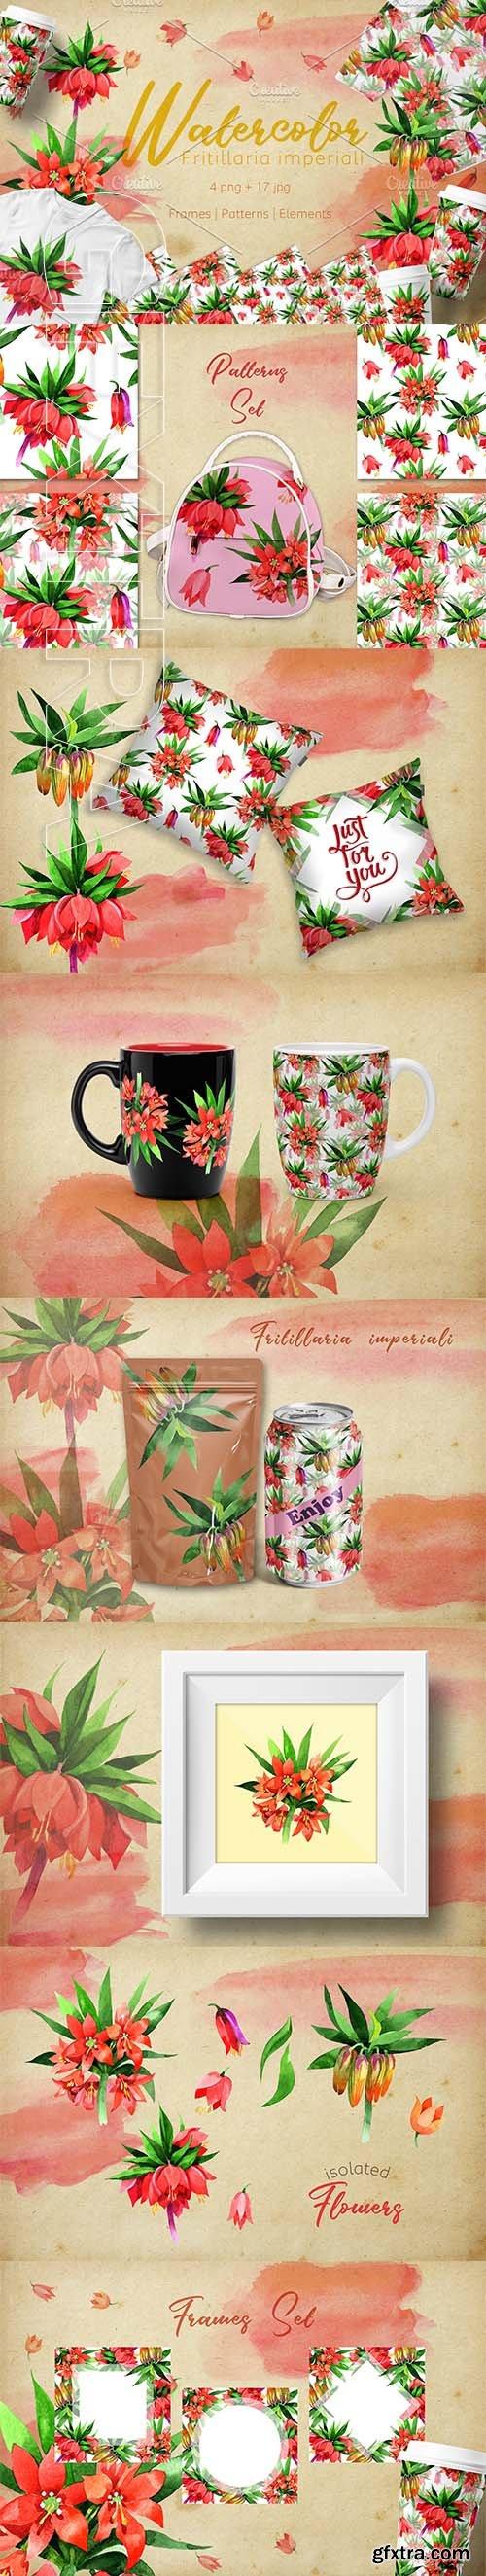 CreativeMarket - Fritillaria imperiali PNG watercolor 2735371